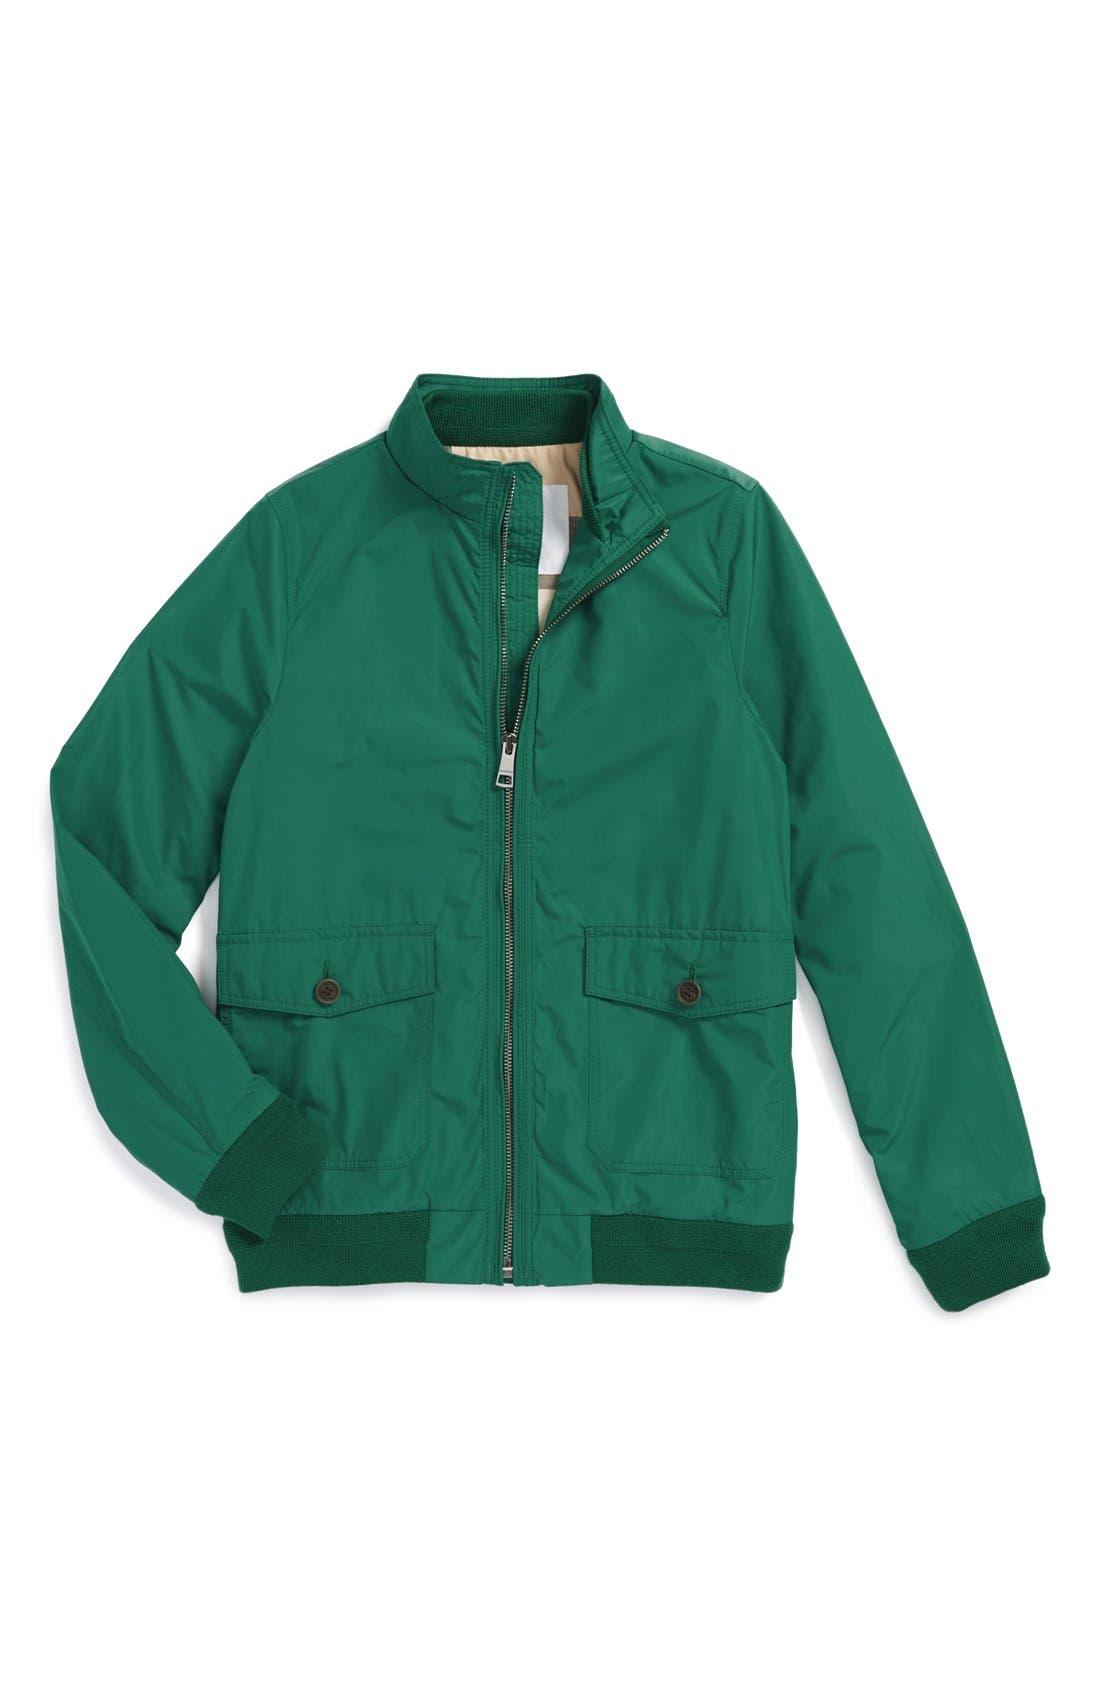 Alternate Image 1 Selected - Burberry Blouson Technical Water Resistant Jacket (Little Boys & Big Boys)